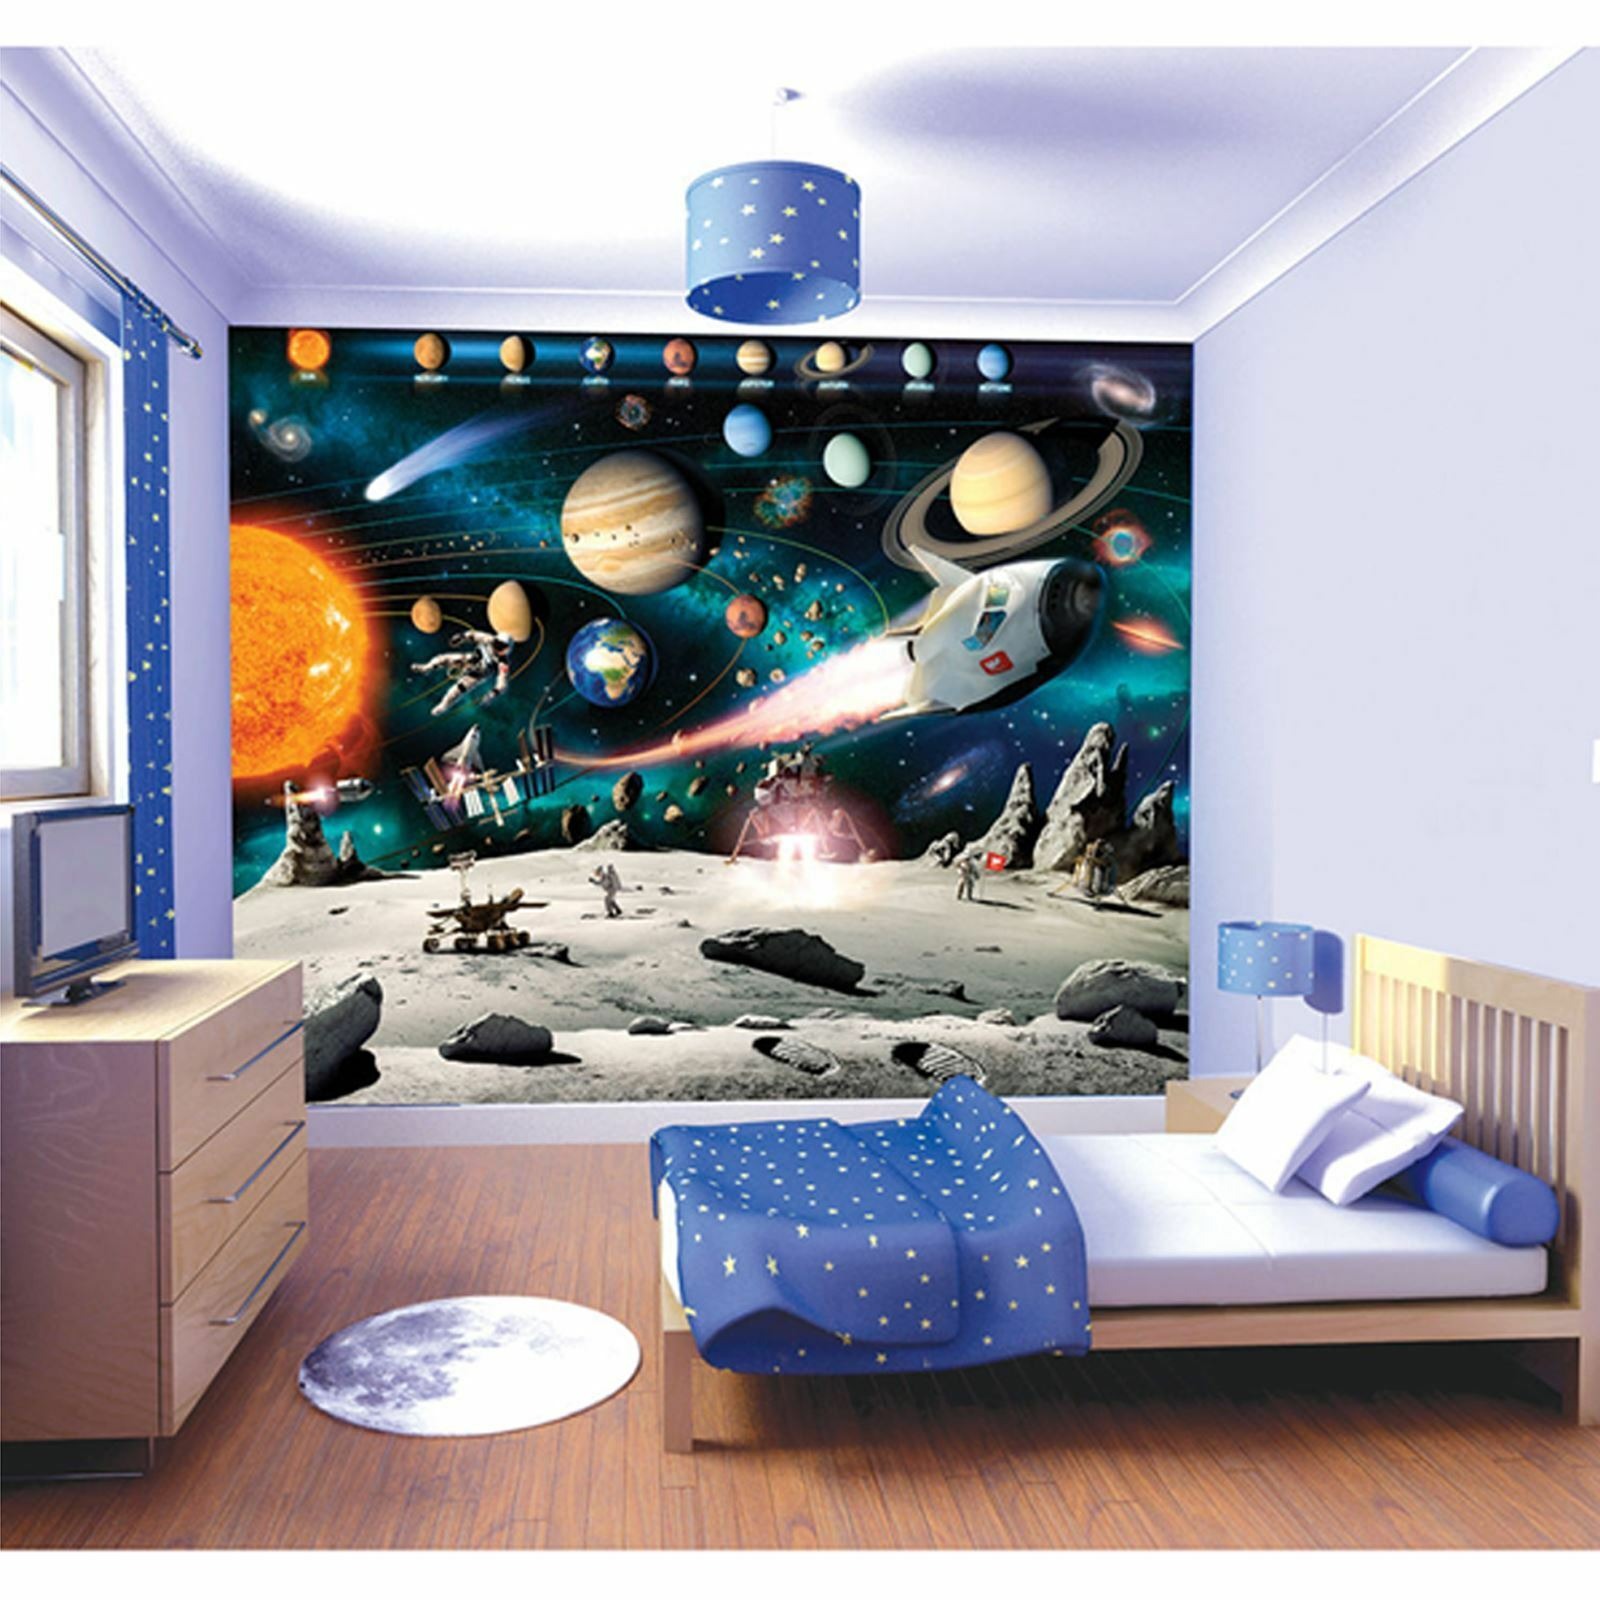 WALLTASTIC SPACE ADVENTURE WALL MURAL 2.44m x 3.05m NEW ROOM DECOR